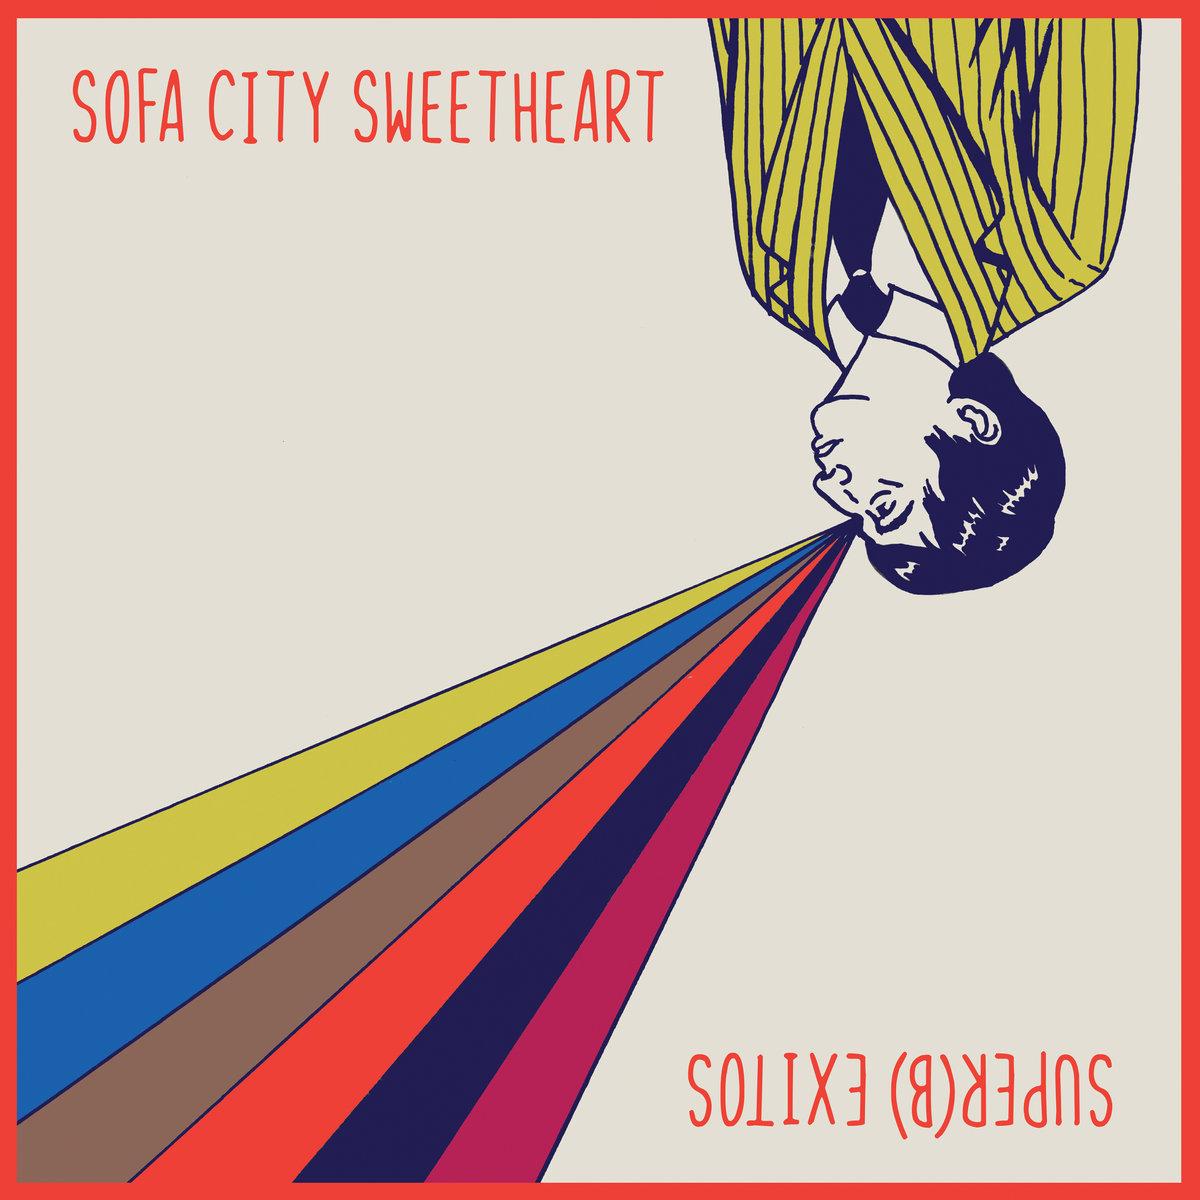 Super B Exitos Sofa City Sweetheart